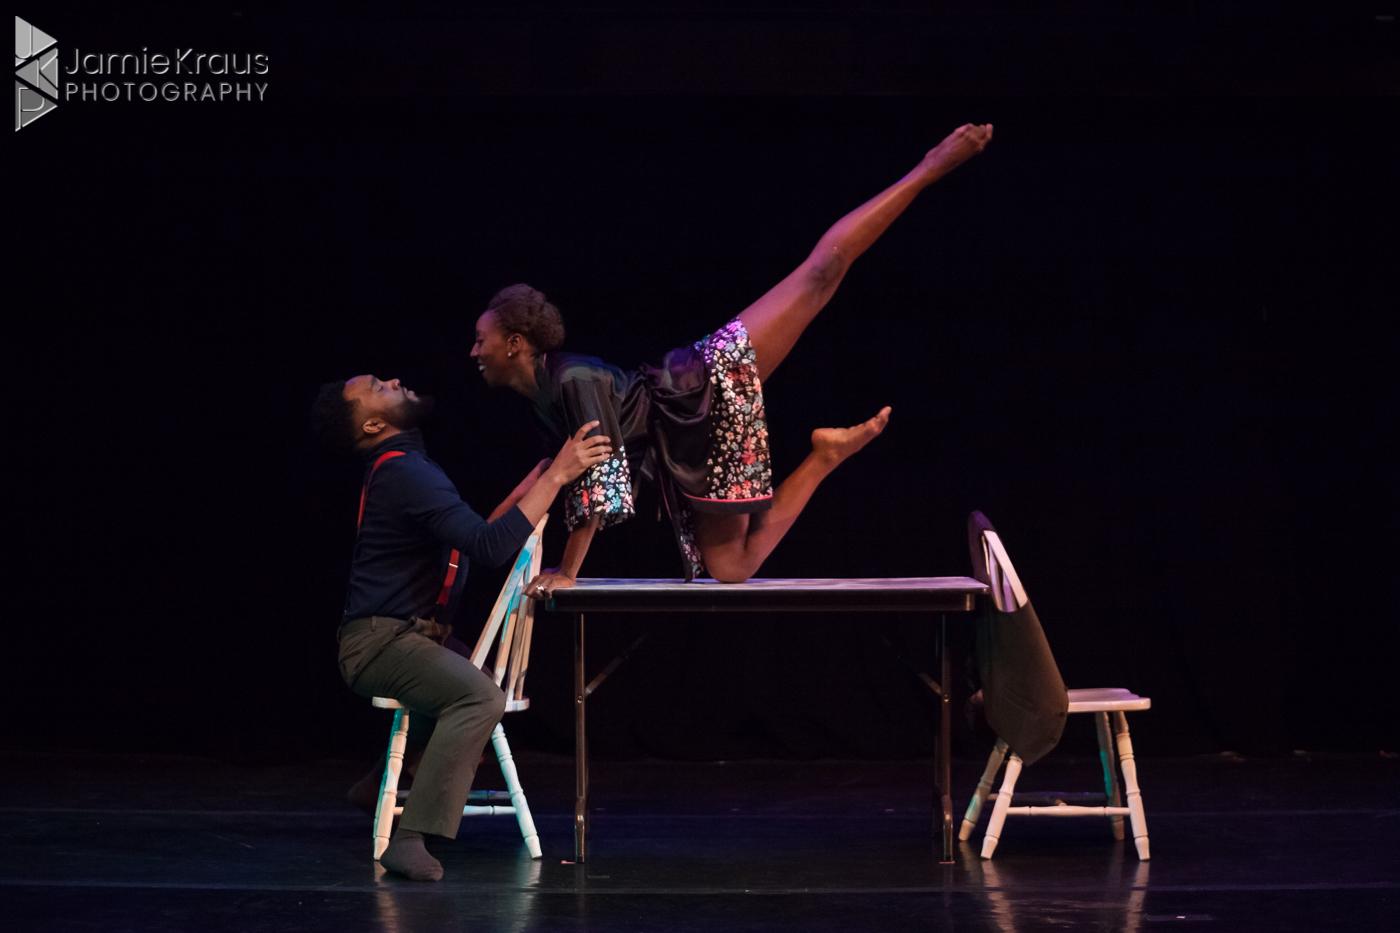 presenting denver dance festival photography